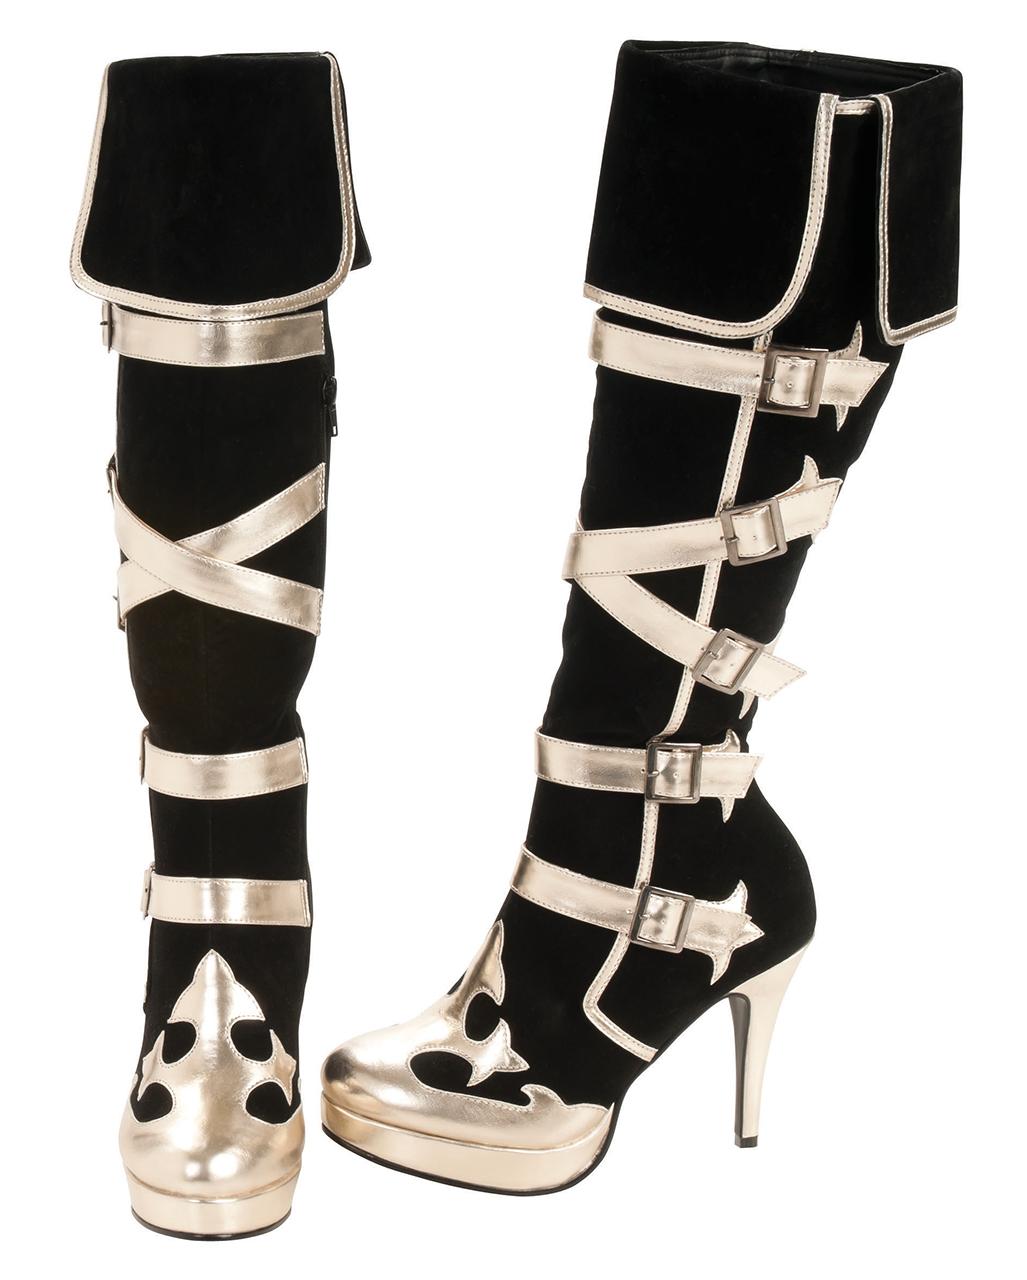 53c24d4b6d9e Pirate Boots Black-gold ☆ buy